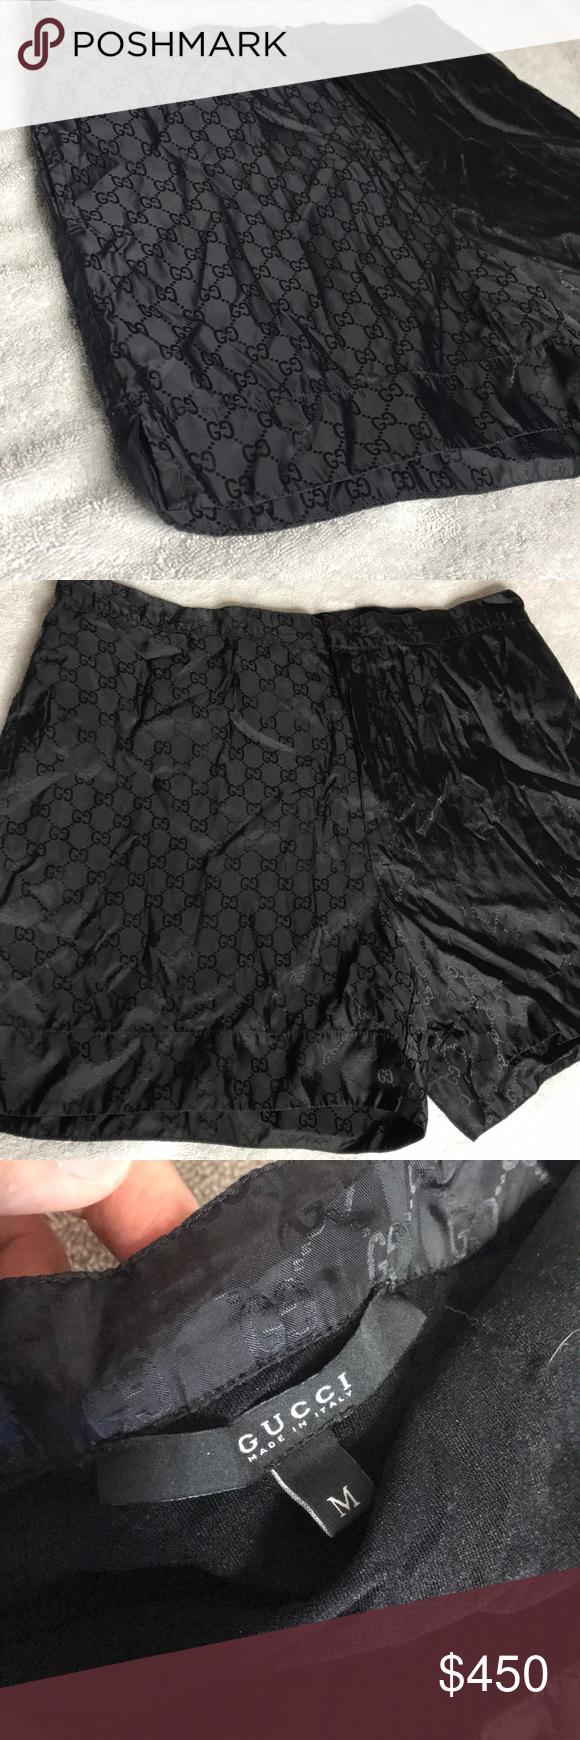 ac79e70194 Gucci Swim trunks Size: medium. Color black very well taken care of great  condition Gucci Swim Swim Trunks